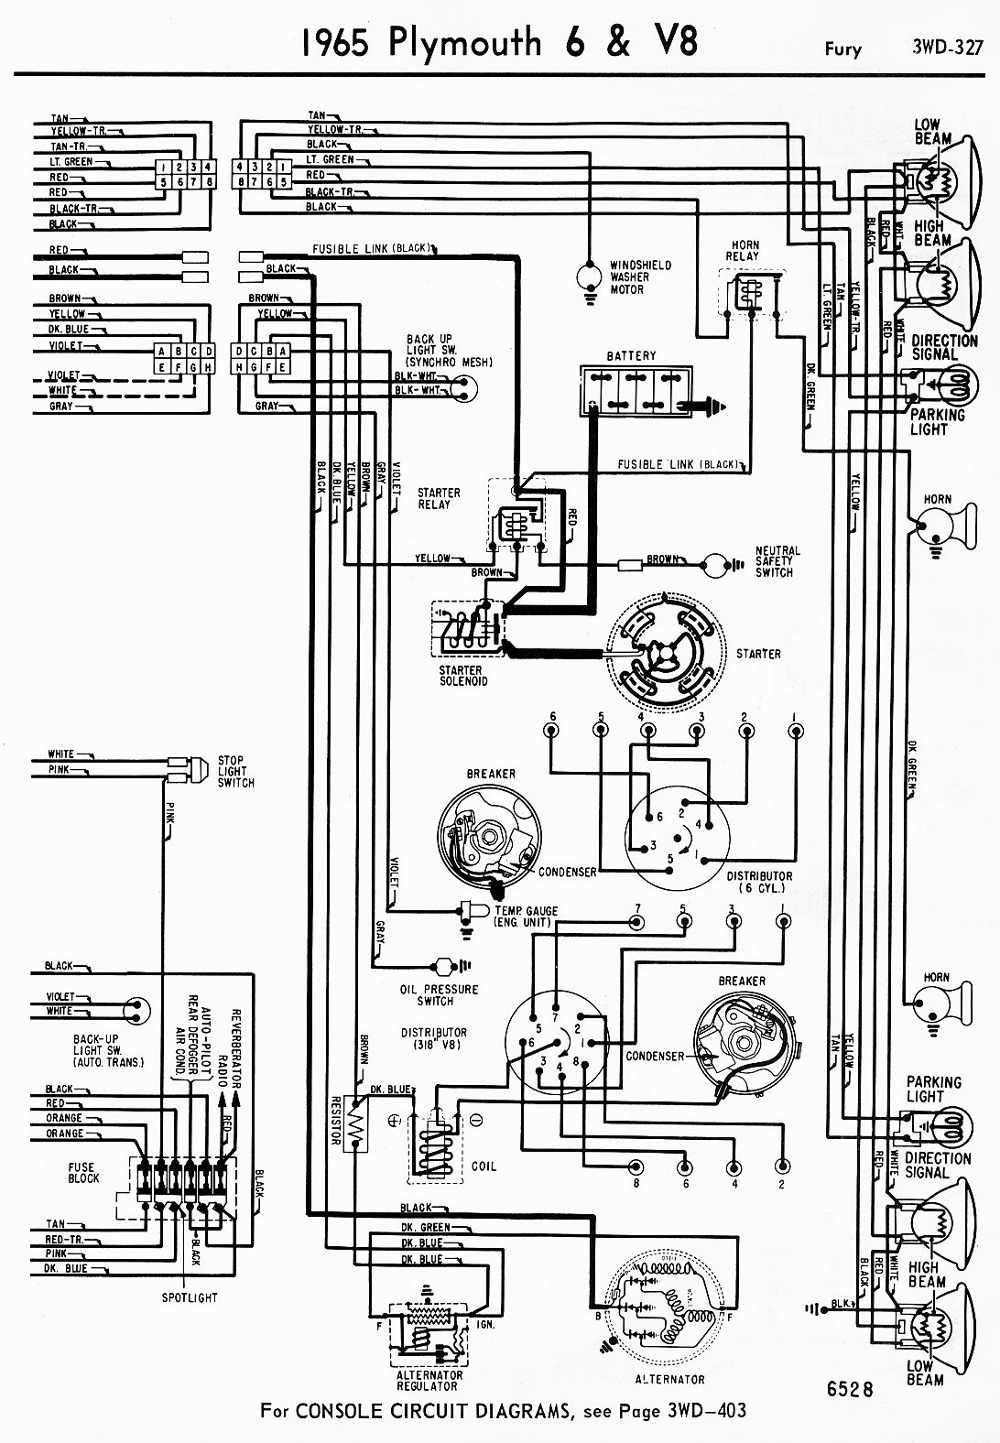 1990 plymouth laser wiring diagram